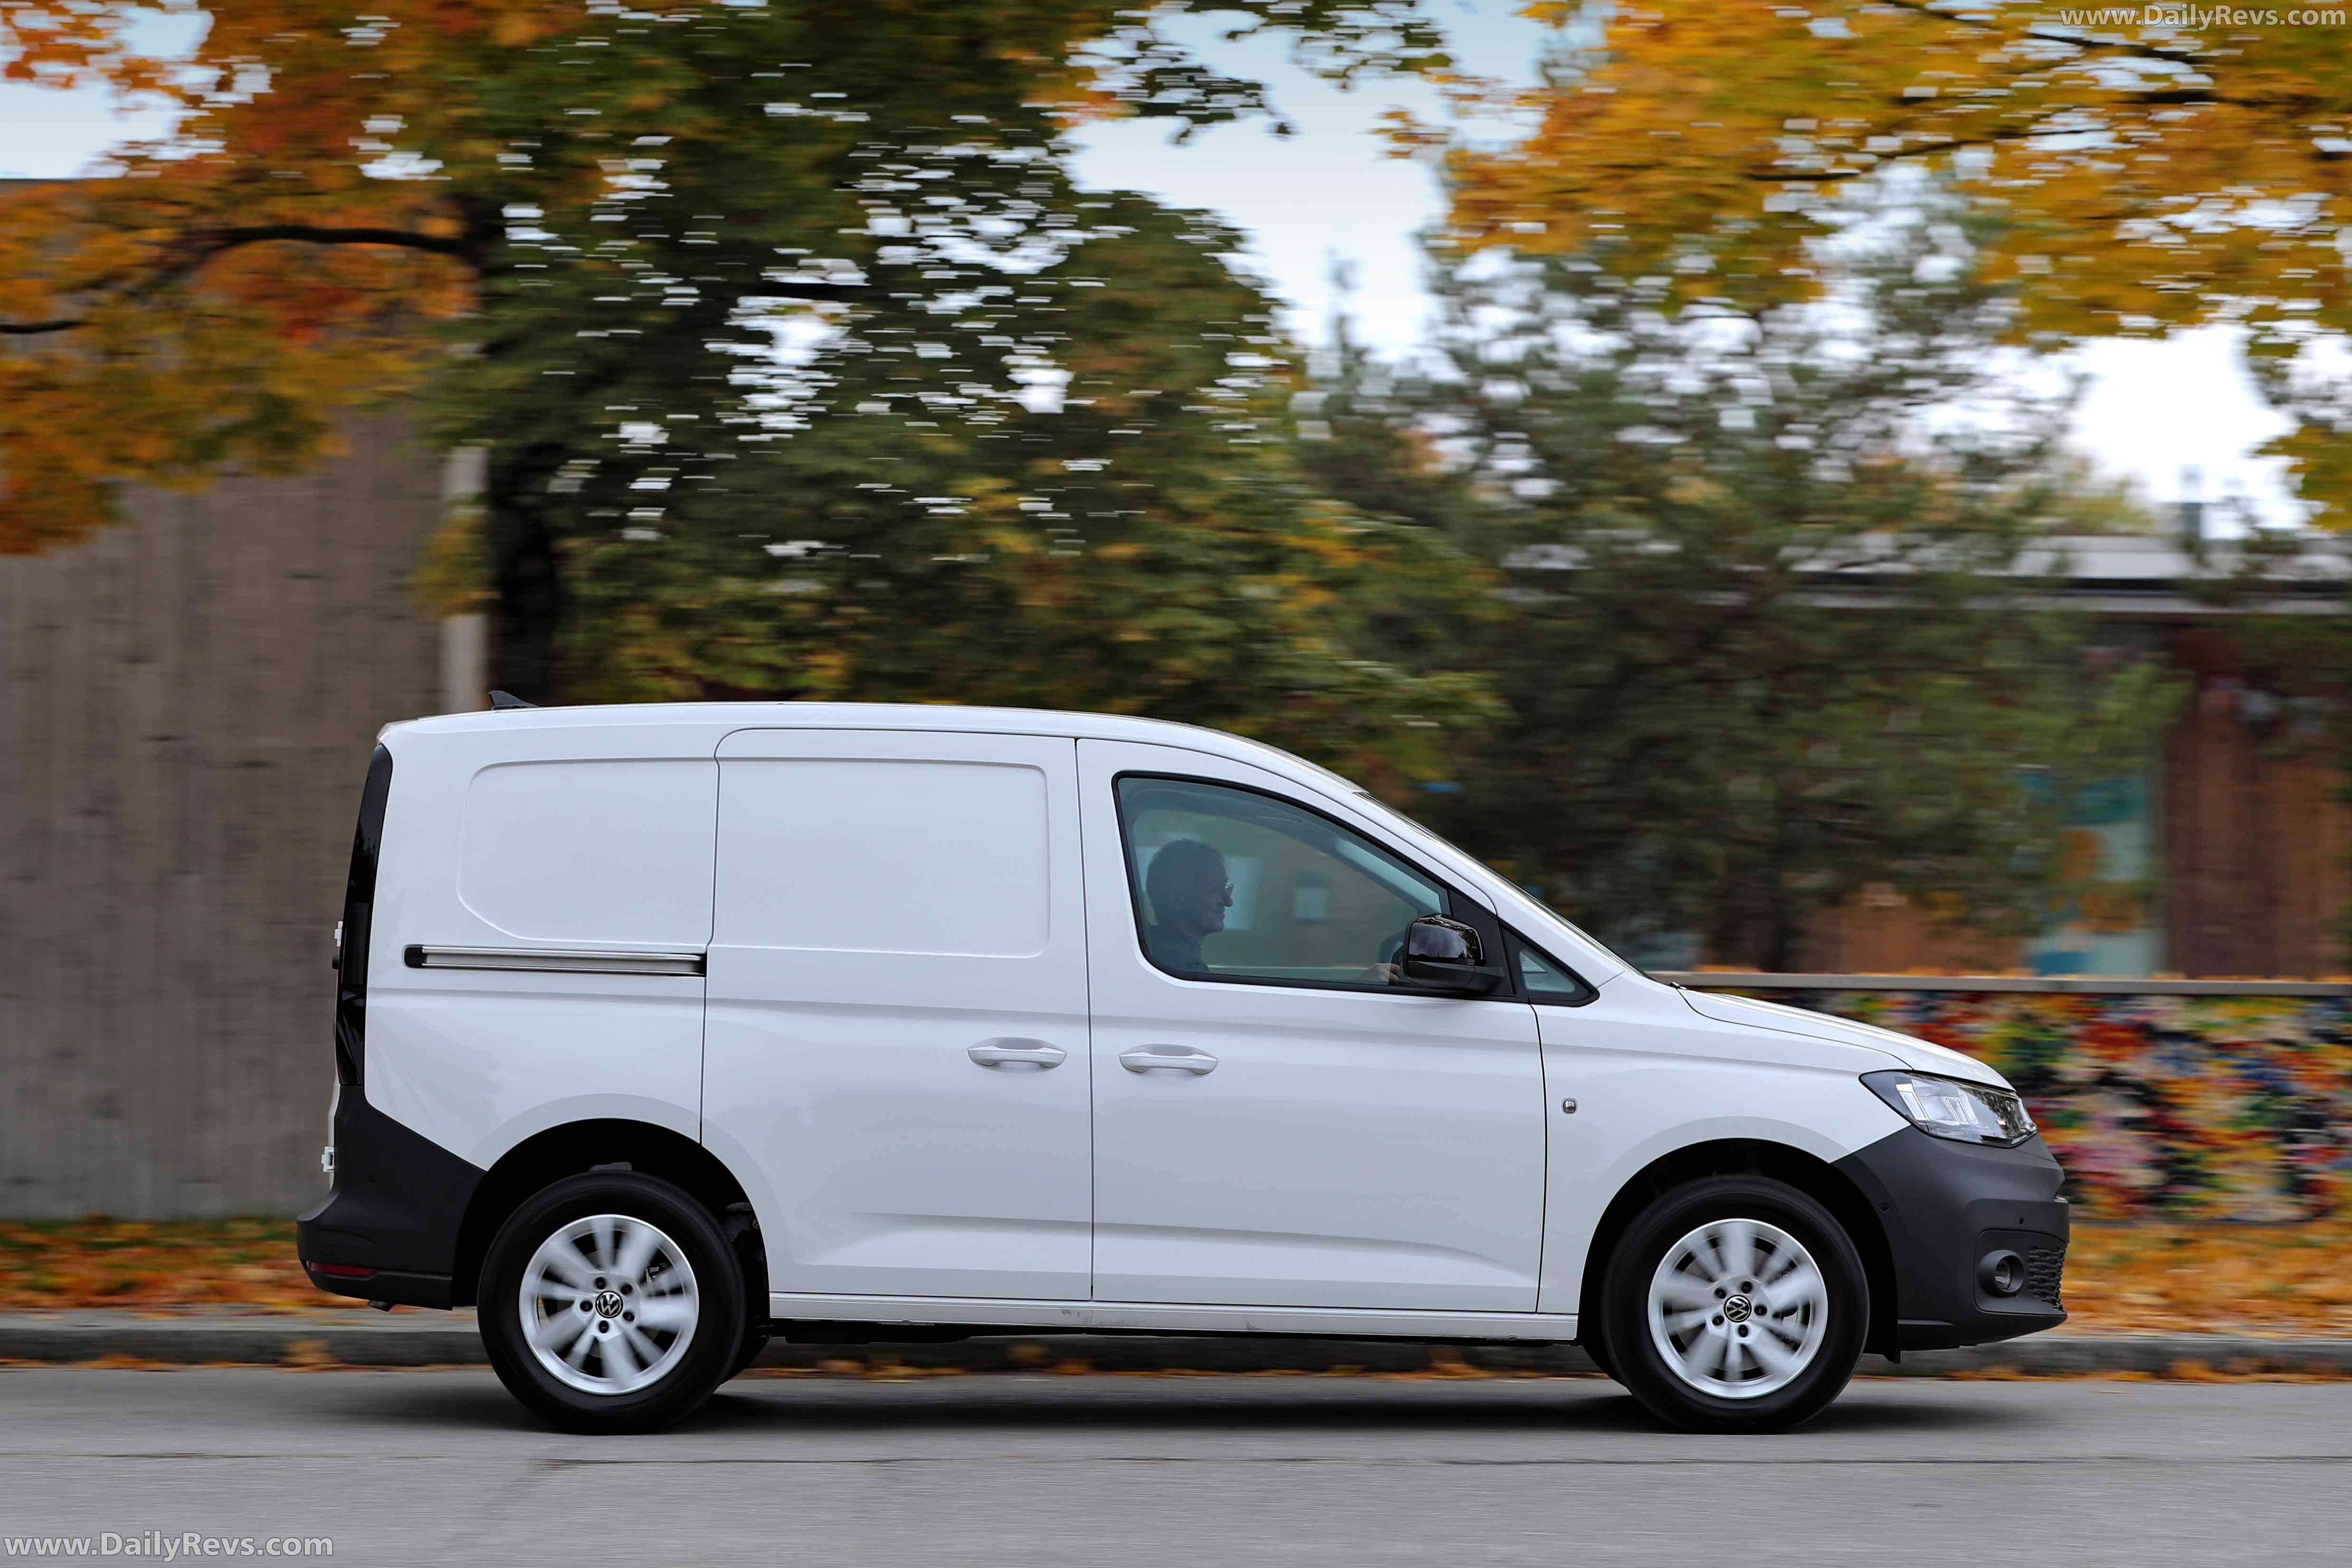 2020 Volkswagen Caddy Hd Pictures Videos Specs Information Dailyrevs